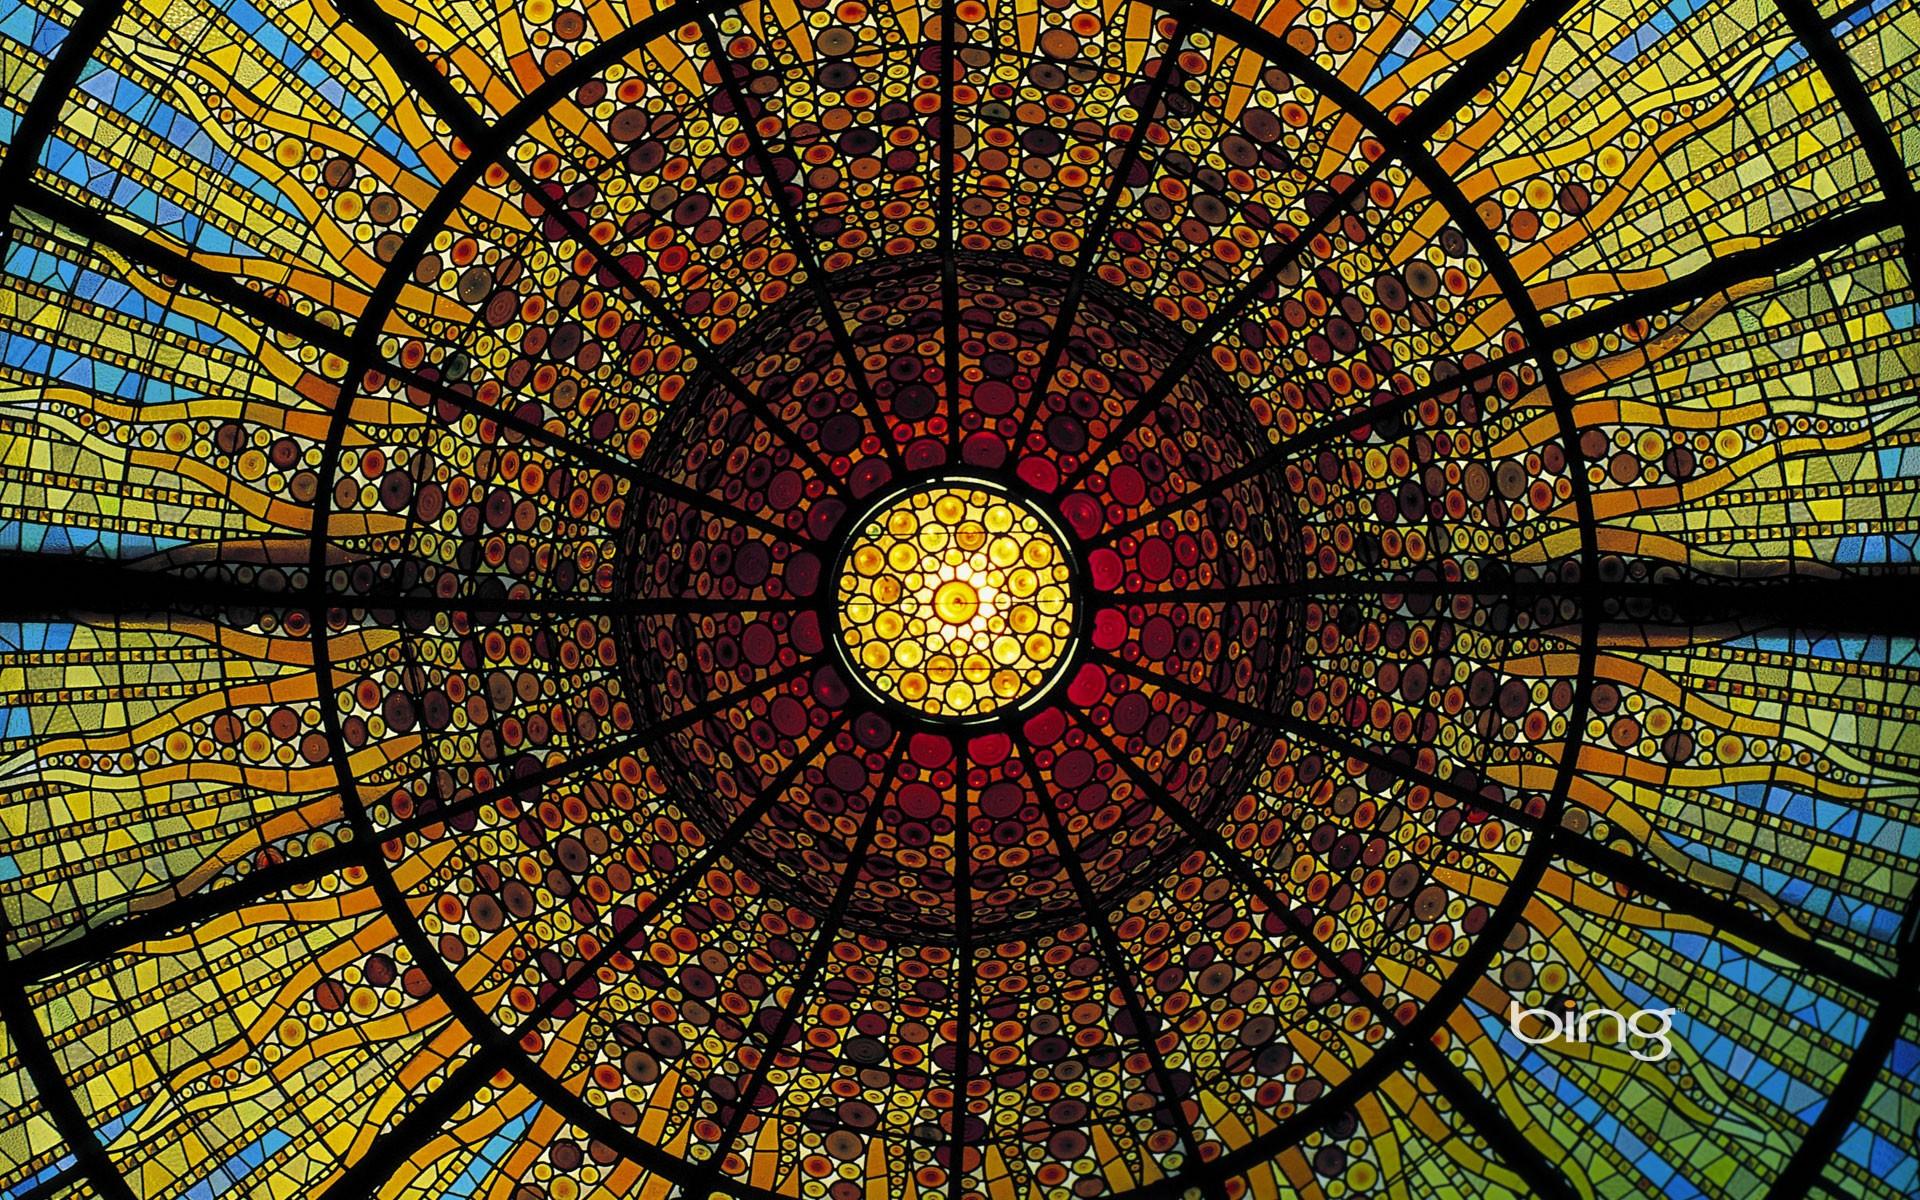 Bing Fall Desktop Wallpaper Hecho Por El Hombre Palau De La M 250 Sica Catalana Barcelona